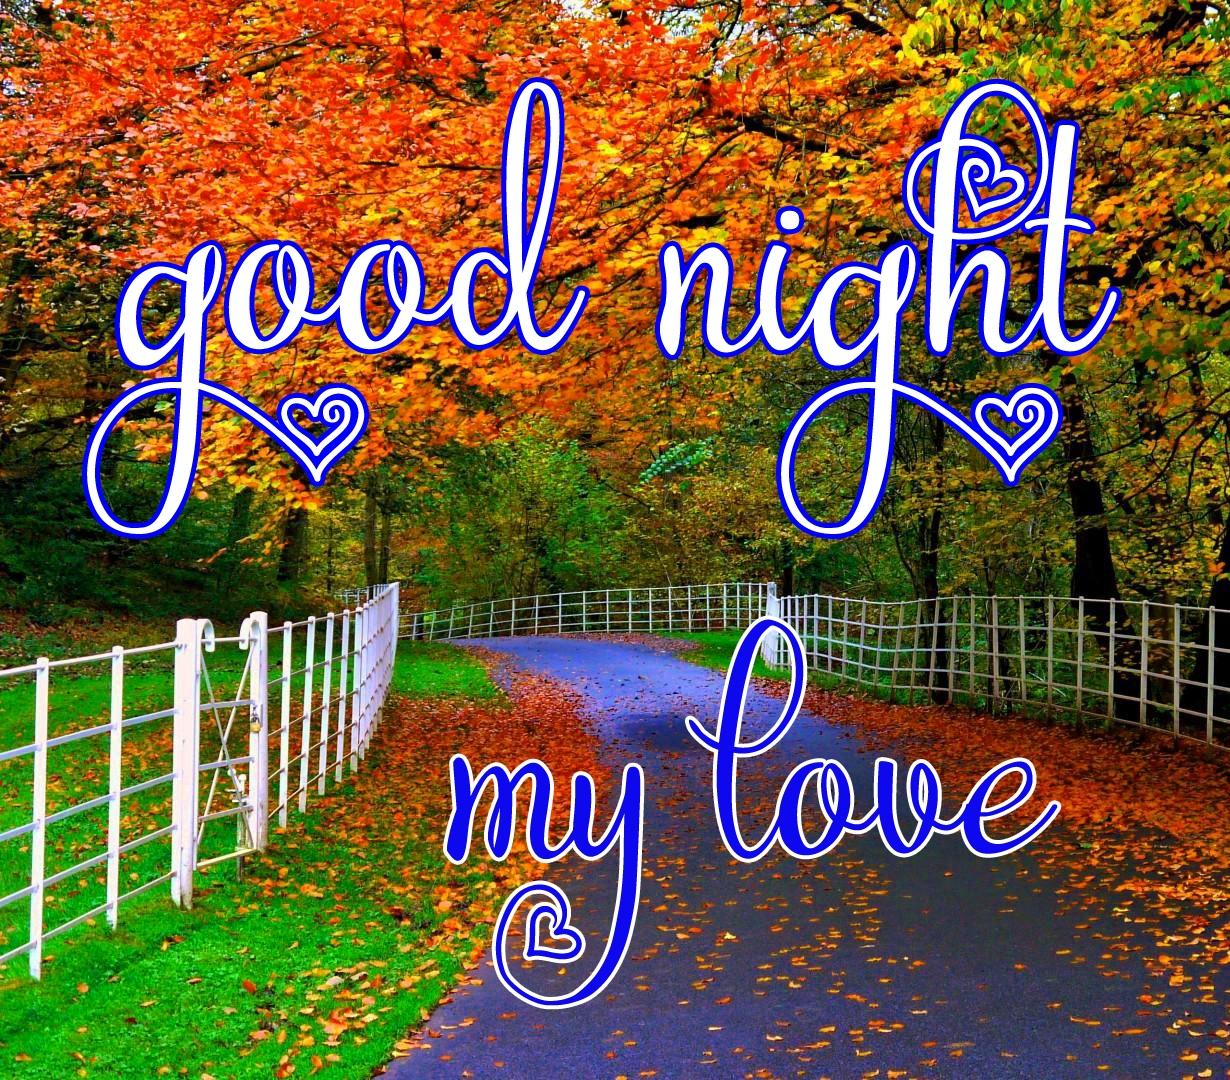 Free good night Images 31